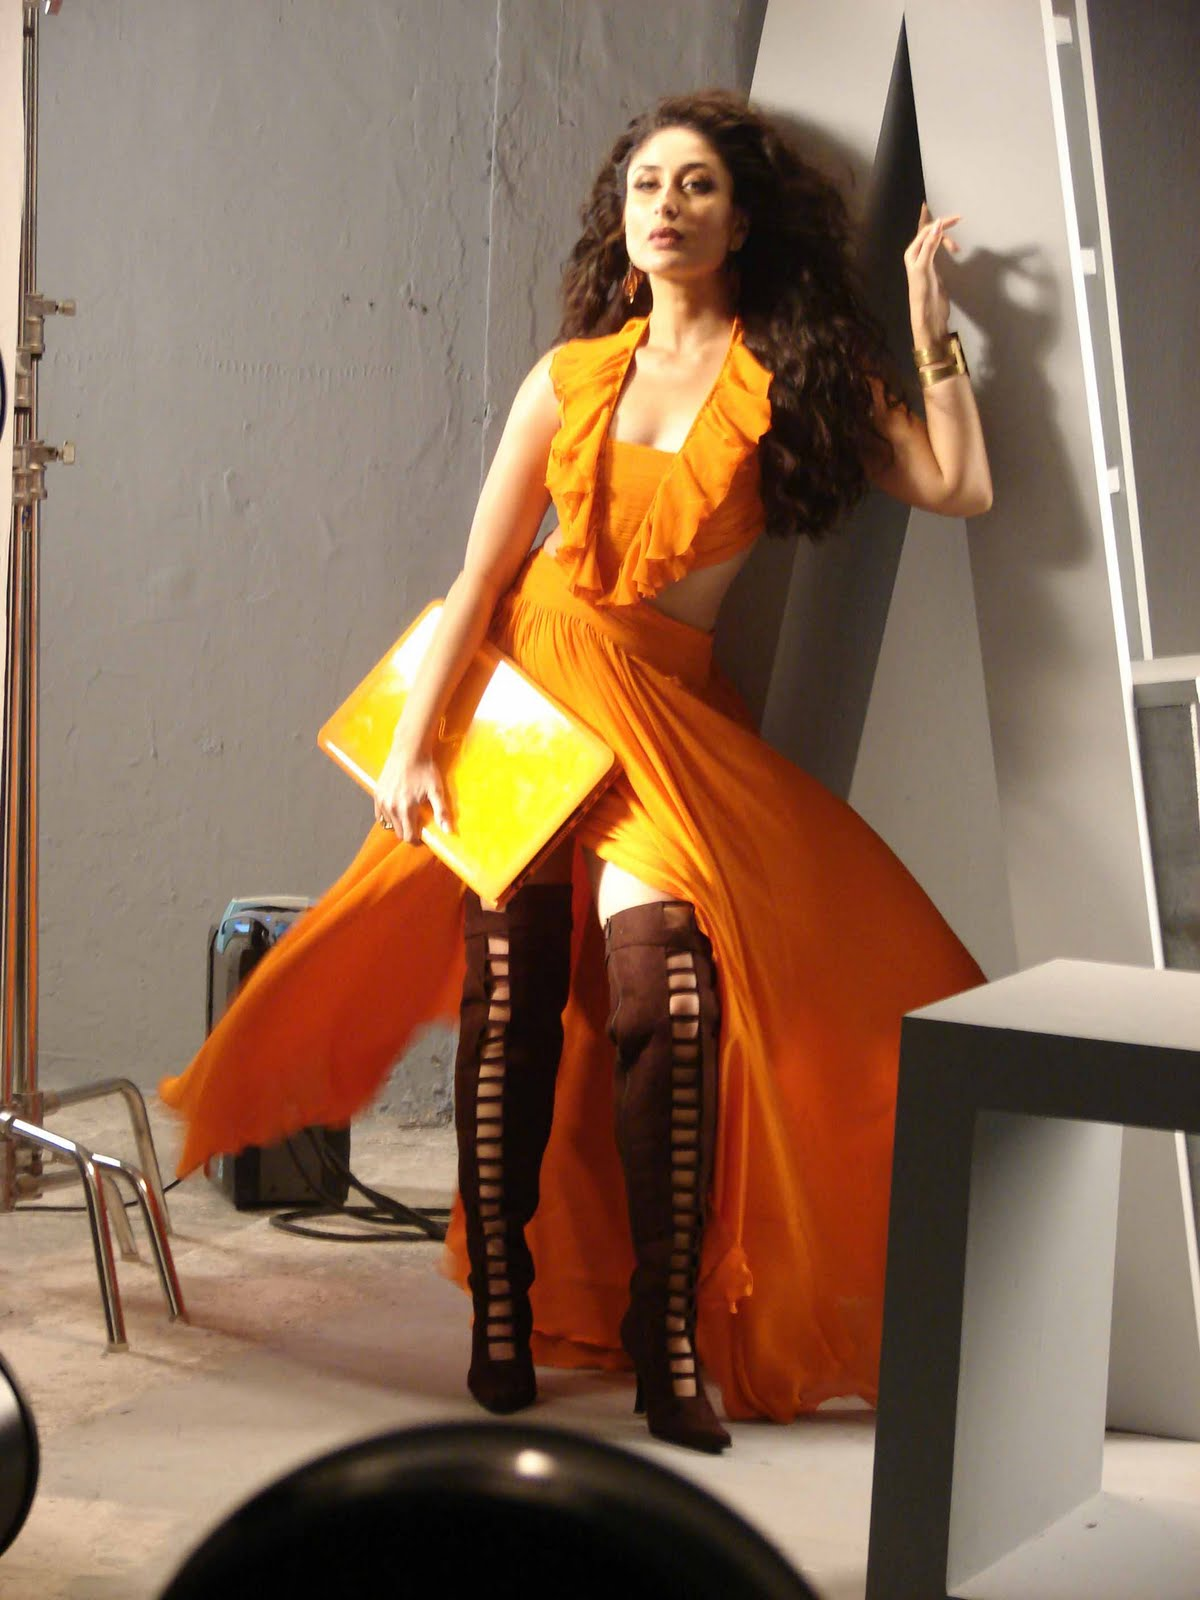 karina kapoor com sexy video con